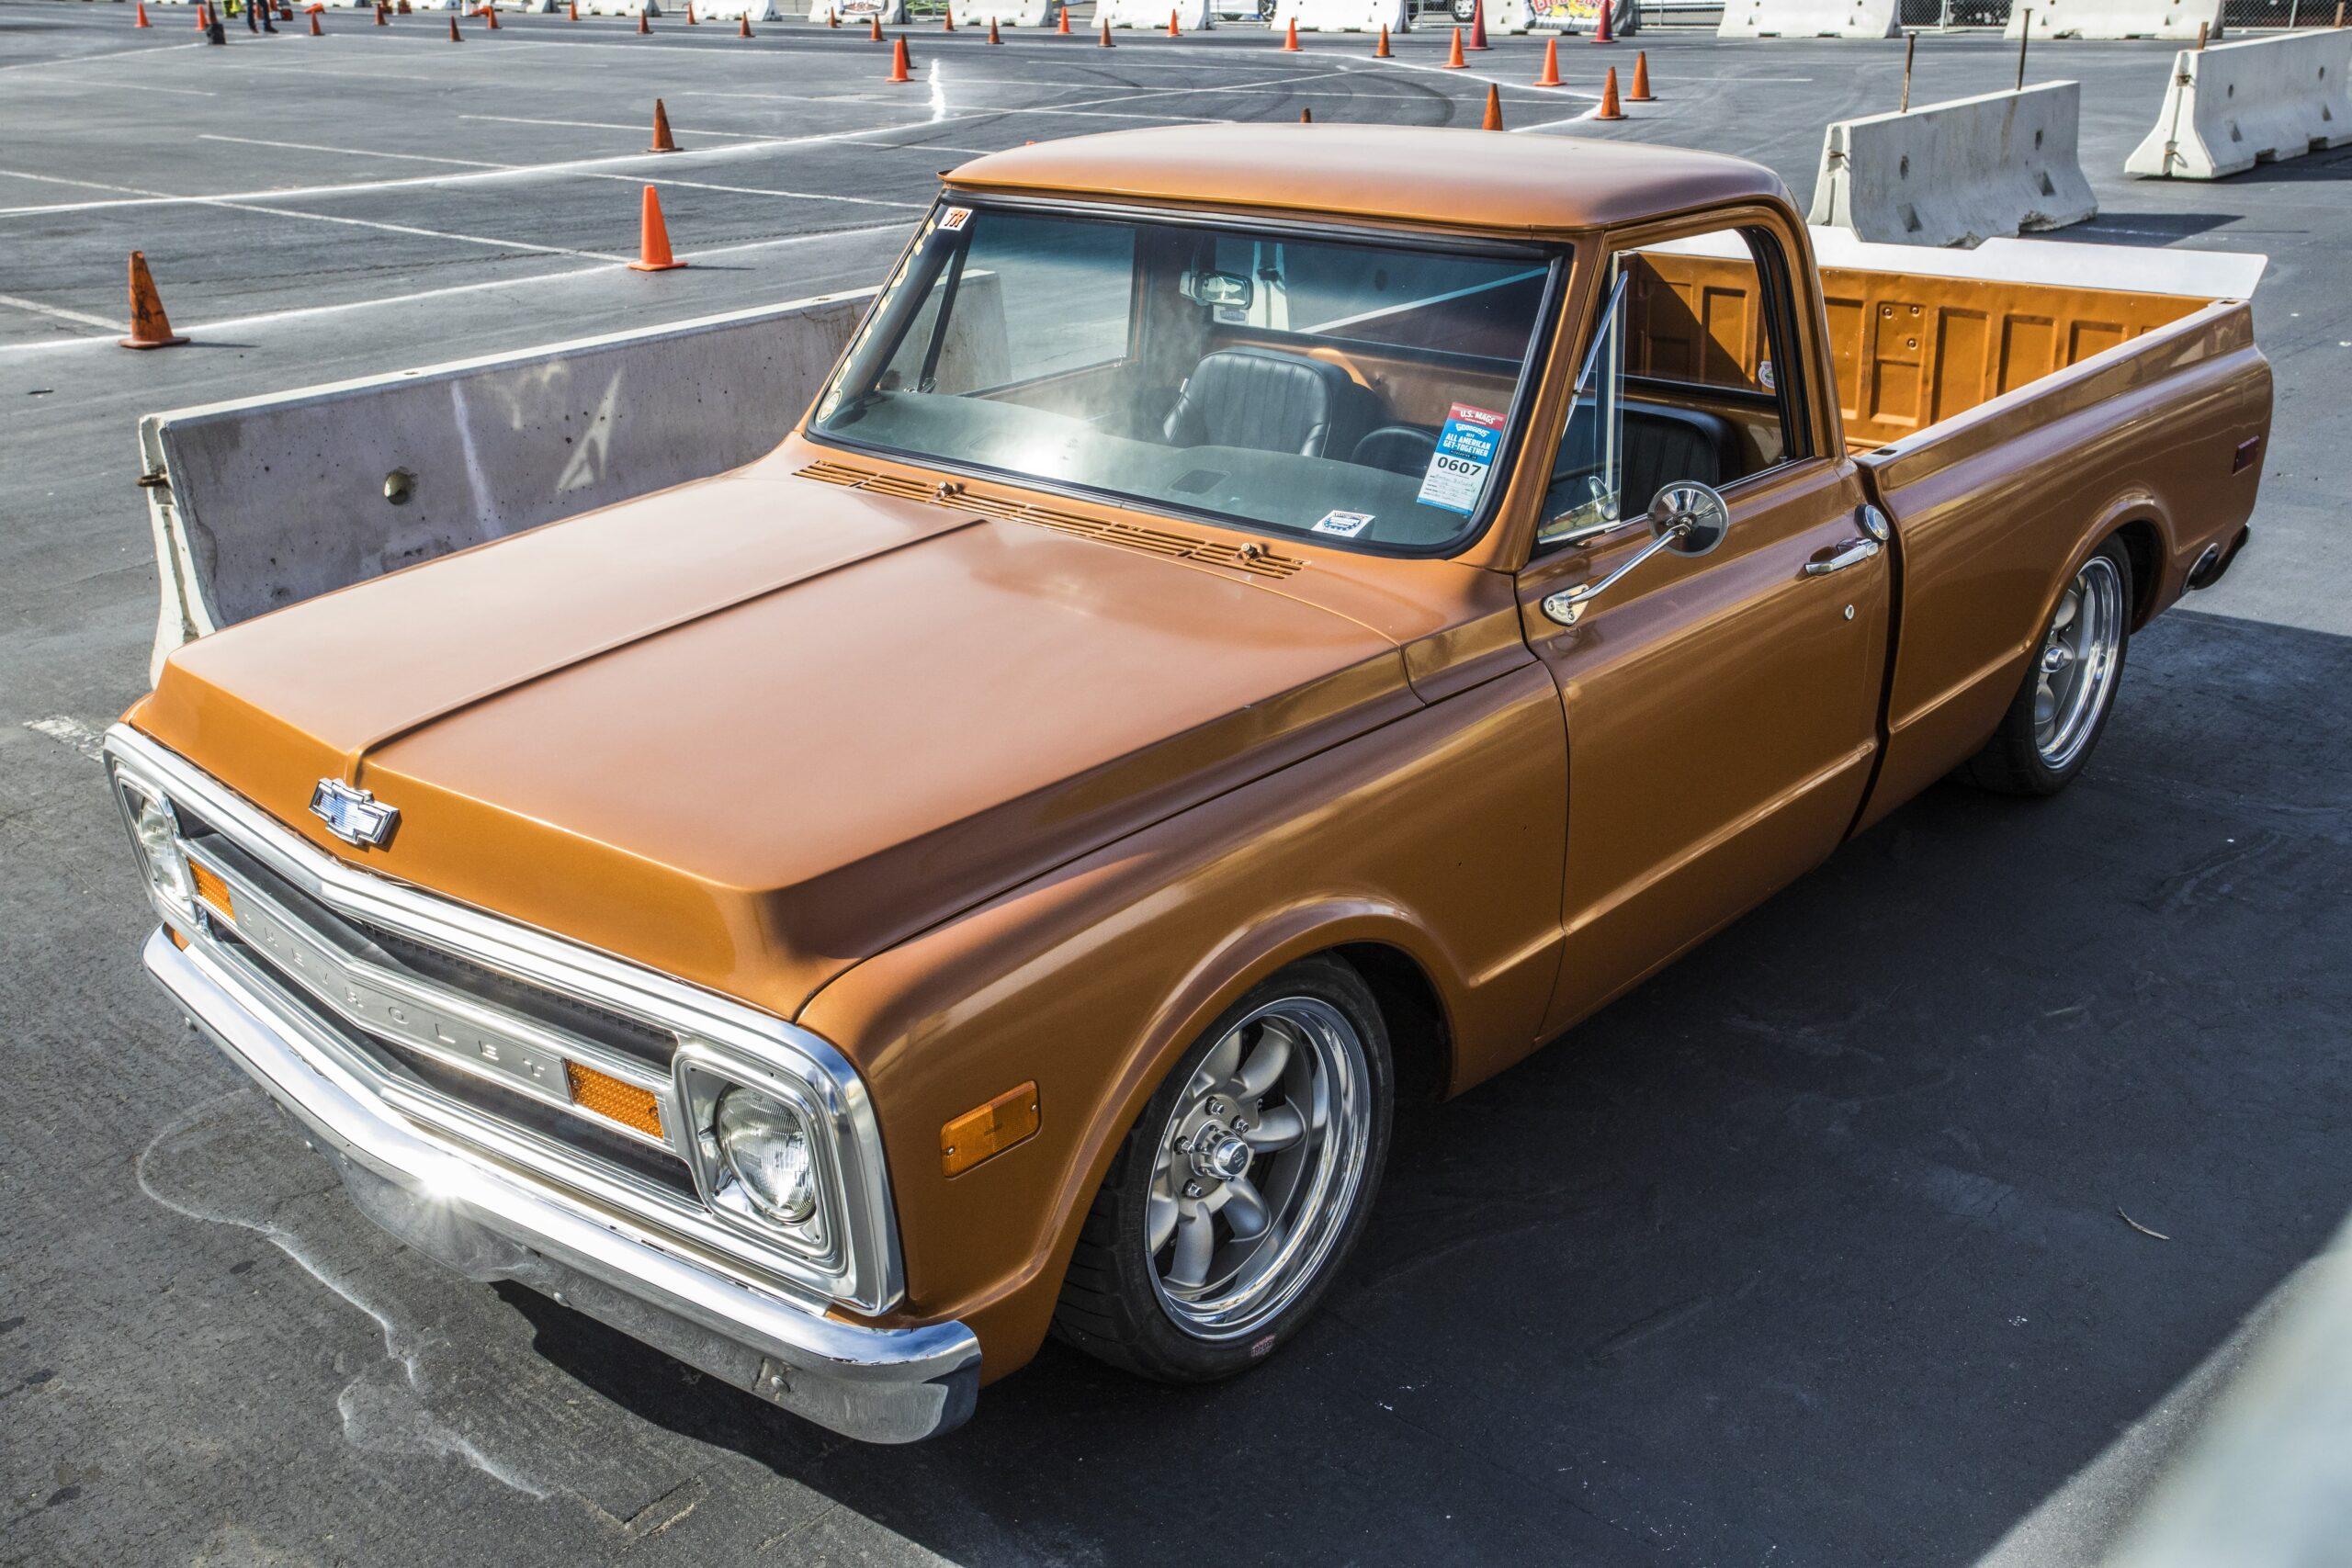 Matthew Mielczarek - San Jose, CA -1970 Chevy c10